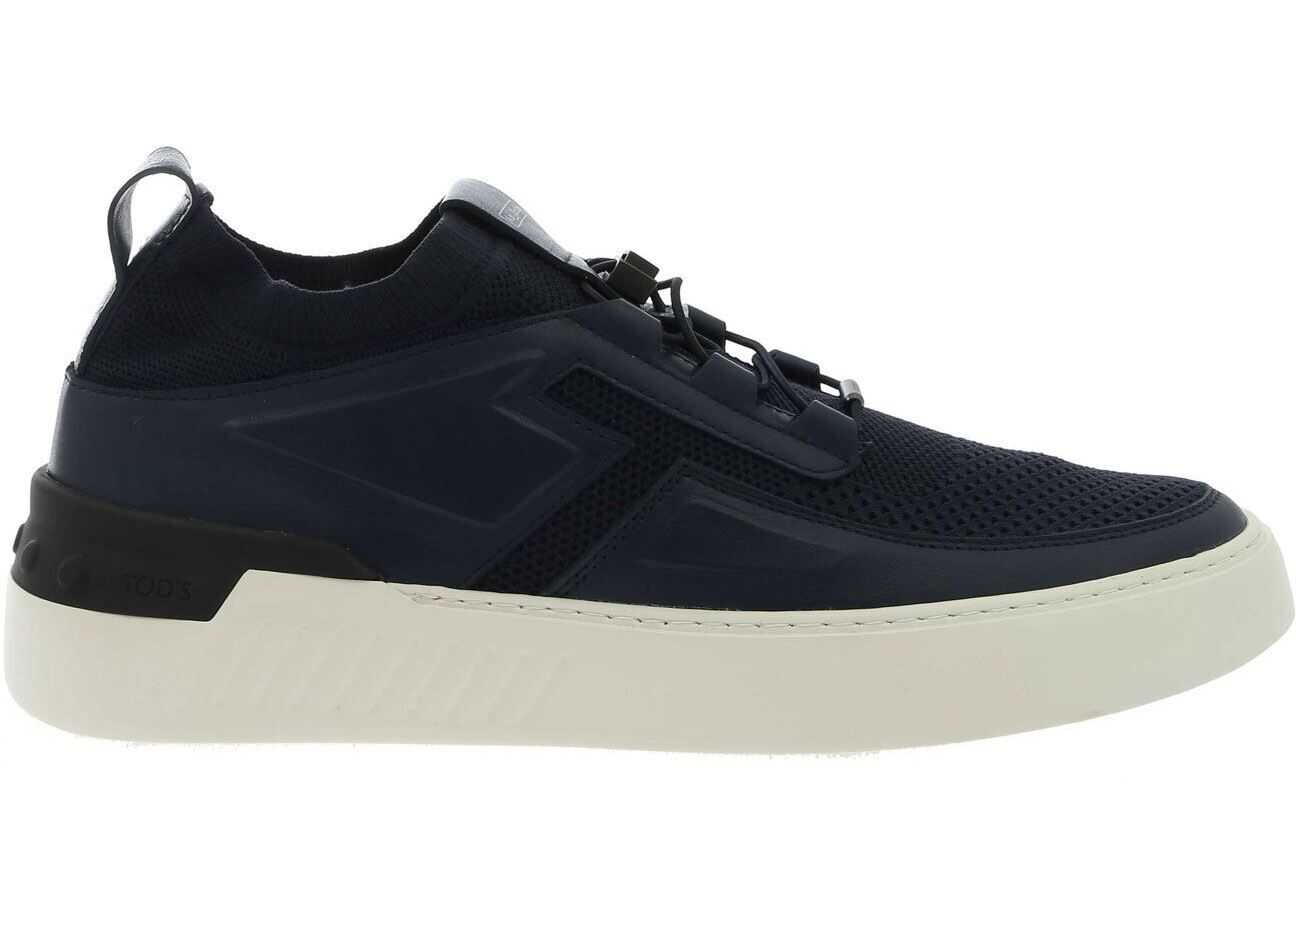 TOD'S No Code X Sneakers In Blue XXM14C0CM30NXI9998 Blue imagine b-mall.ro